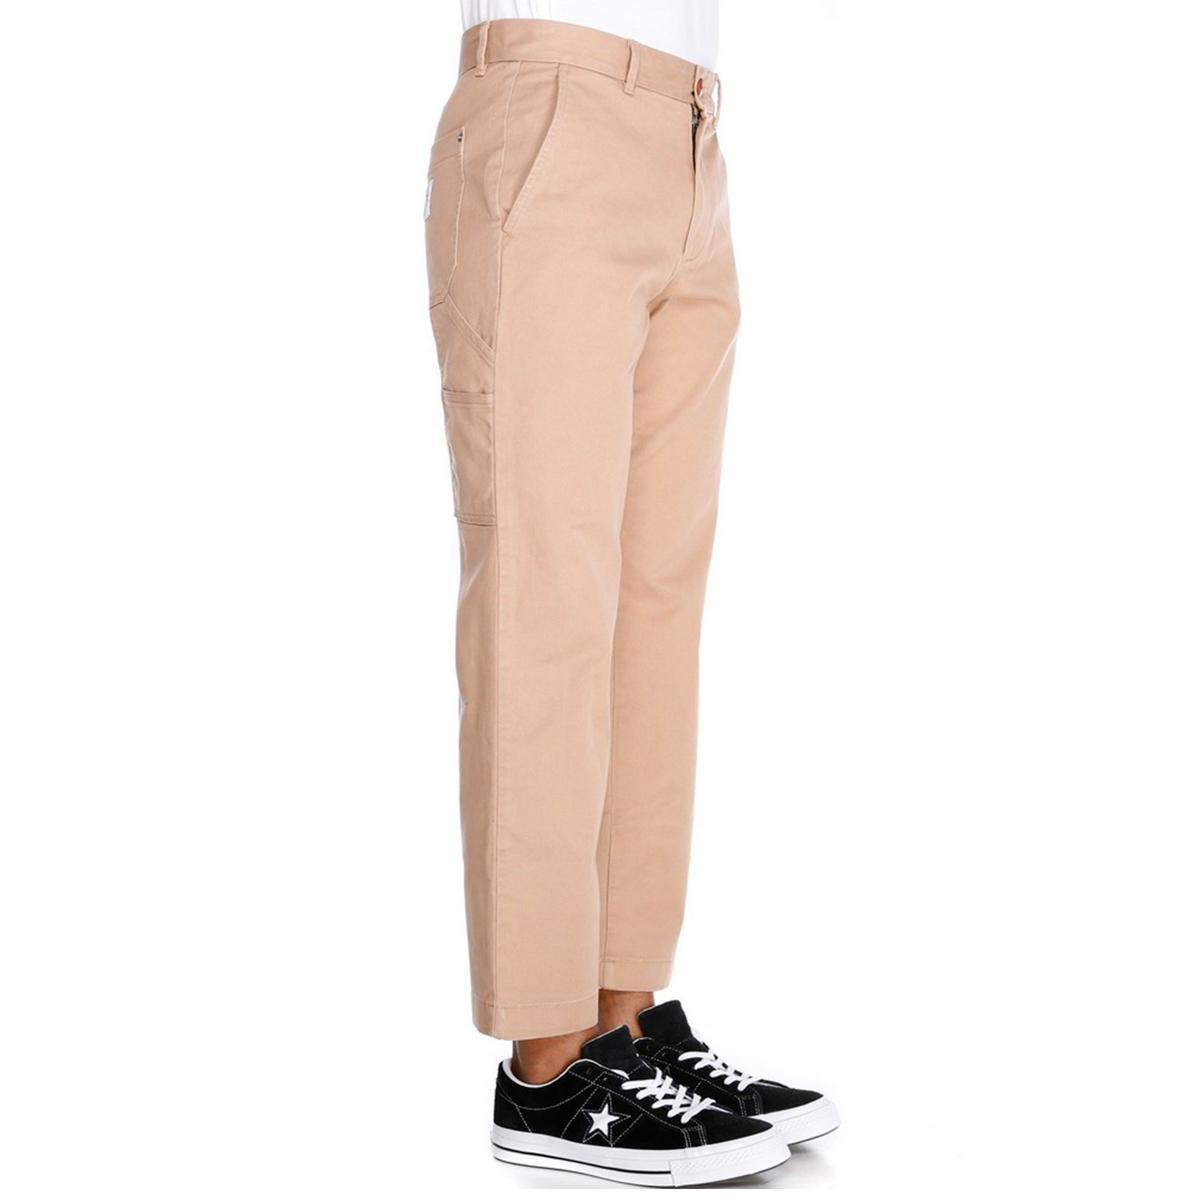 Pantaloni uomo Tommy Hilfiger Jeans Workwear rif. DM0DM05318 246